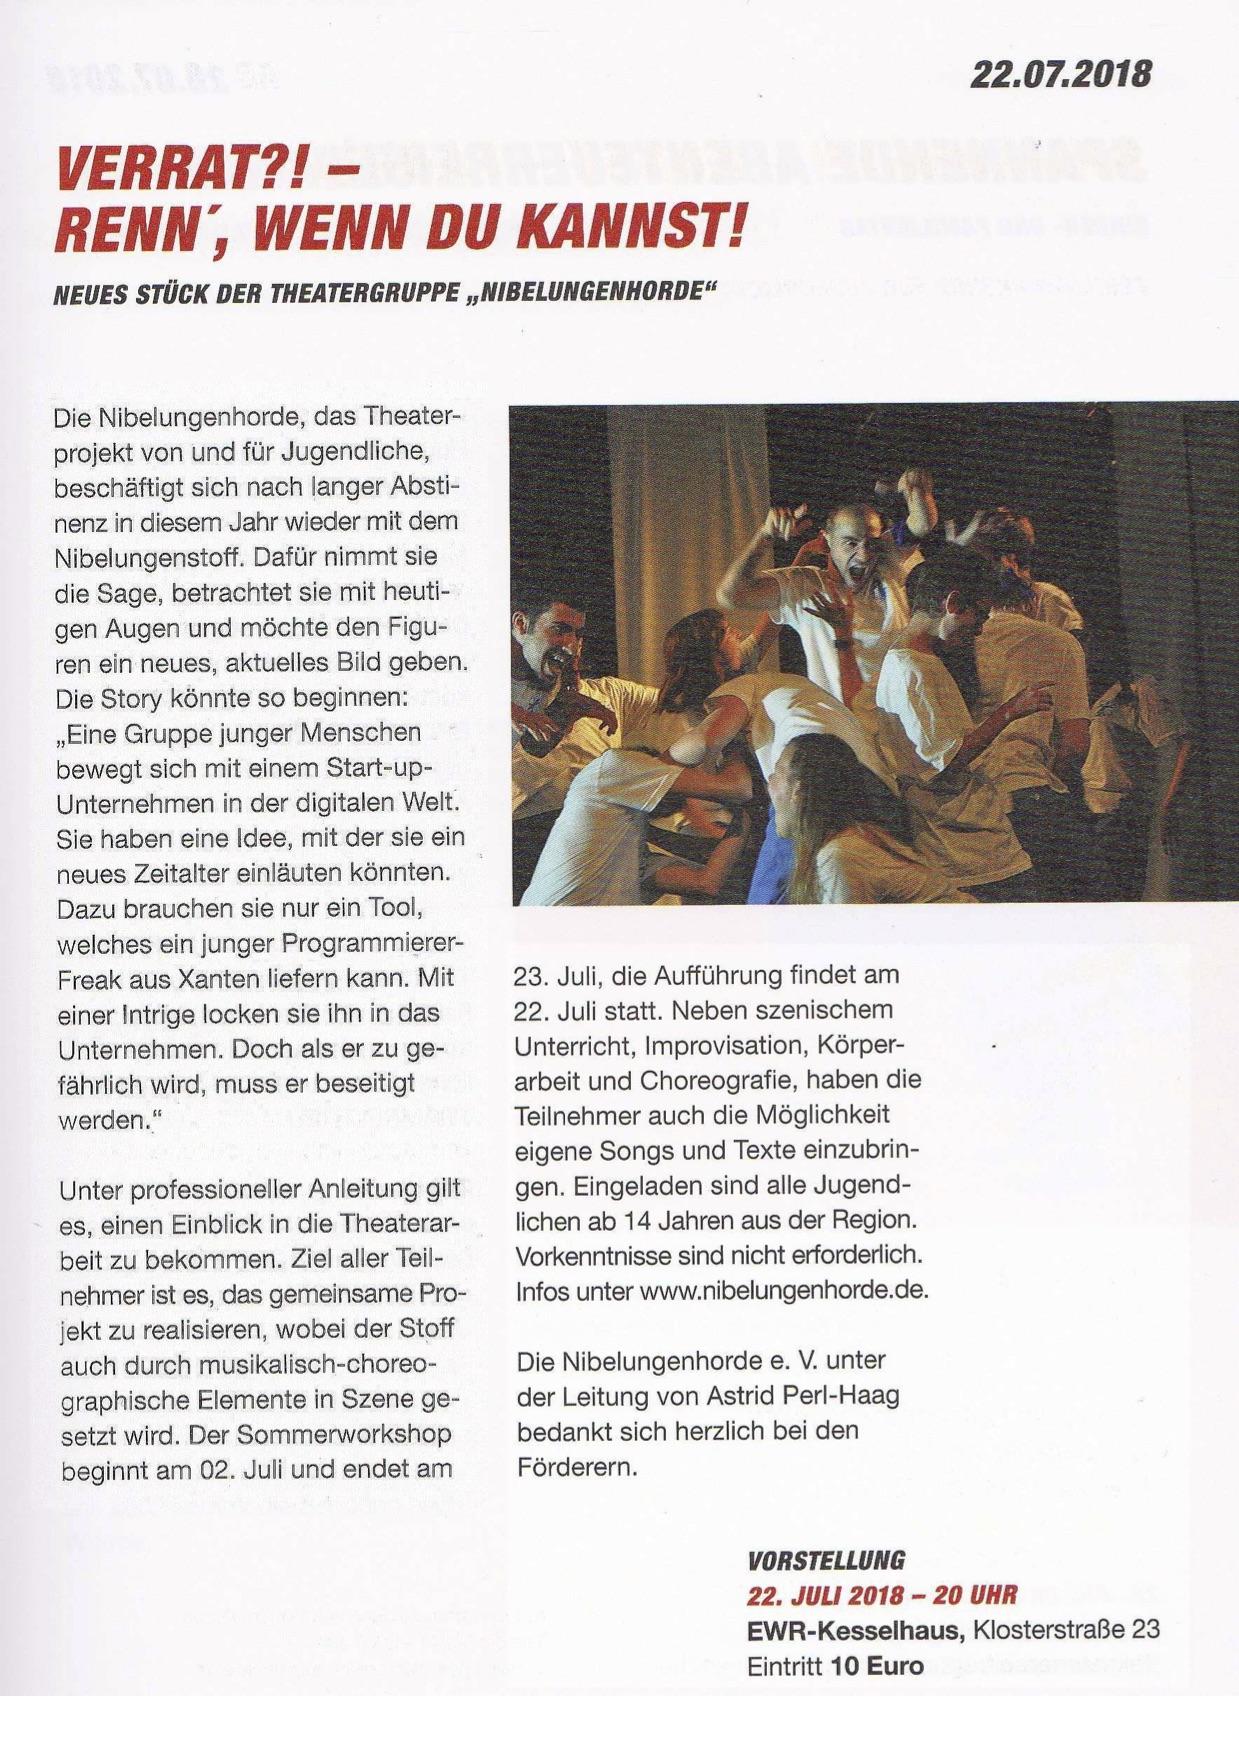 Kulturprogramm der Nibelungenfestspiele copy